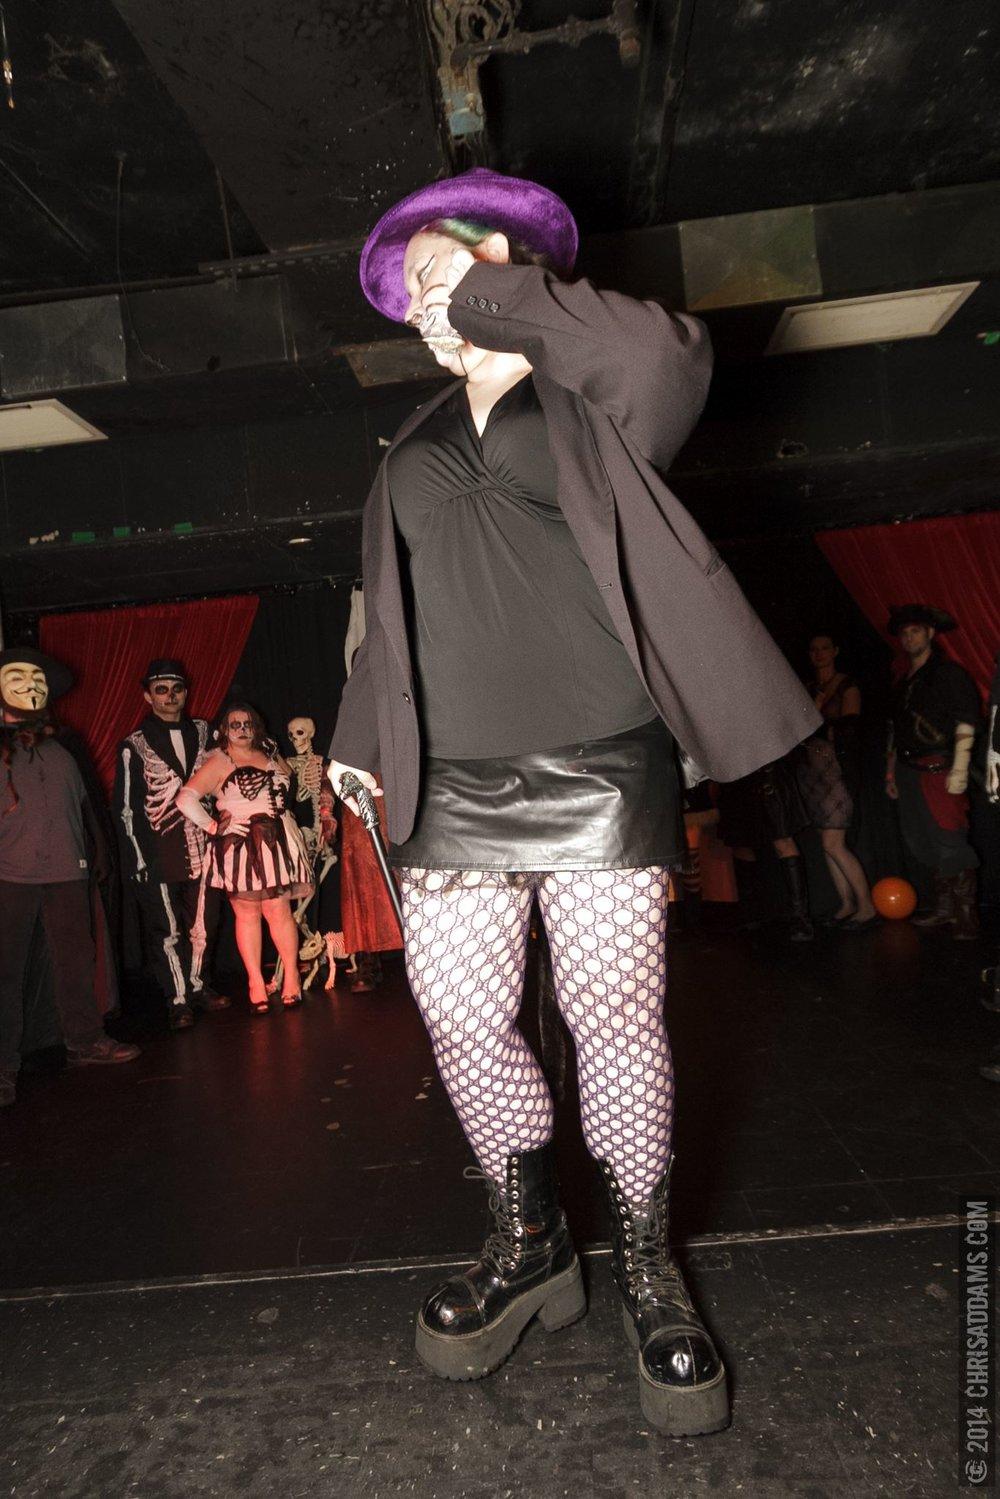 TheHavenClub-Goth-Industrial-Dance-Alternative-Northampton-MA (77).jpg